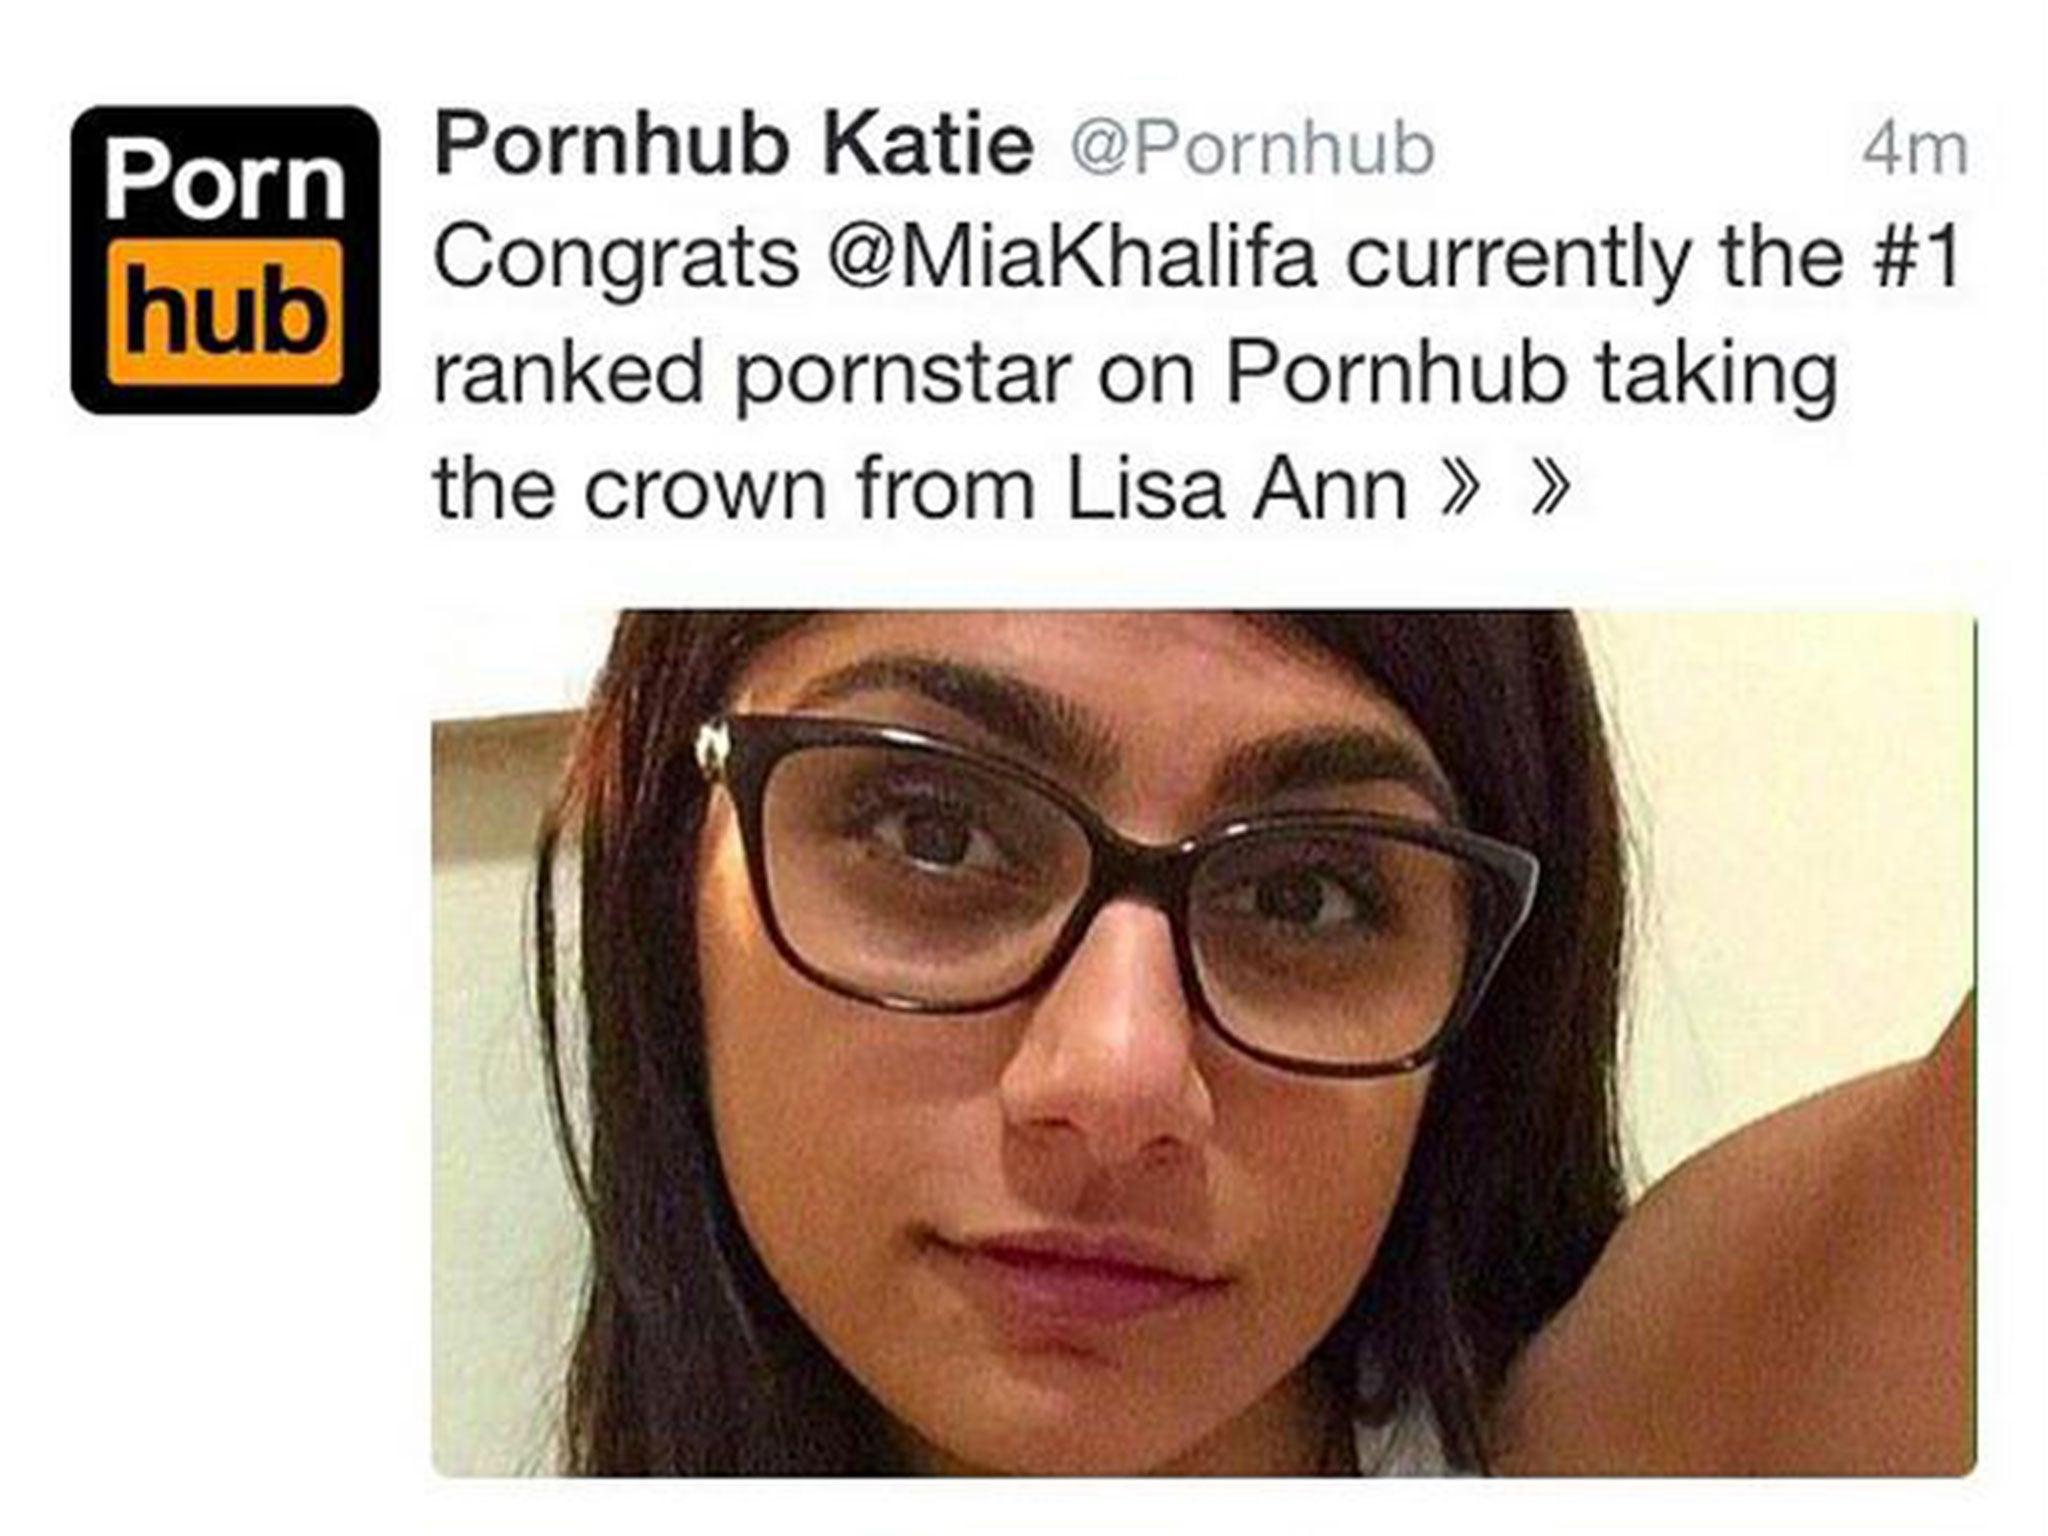 pornhub star mia khalifa receives death threats after being ranked